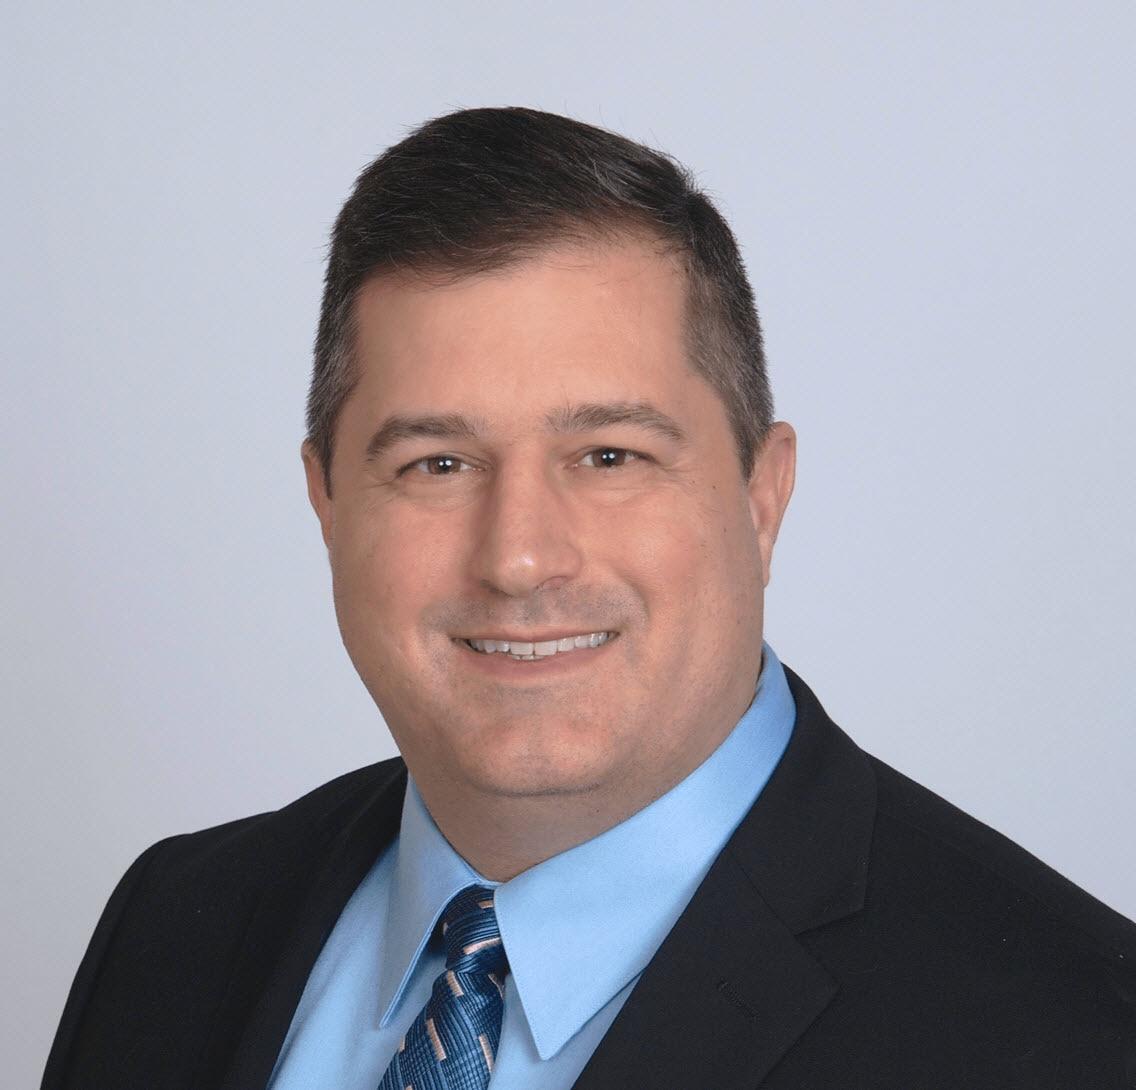 DAVID ANDREW DEANGELIS  Your Registered Representative & Insurance Agent